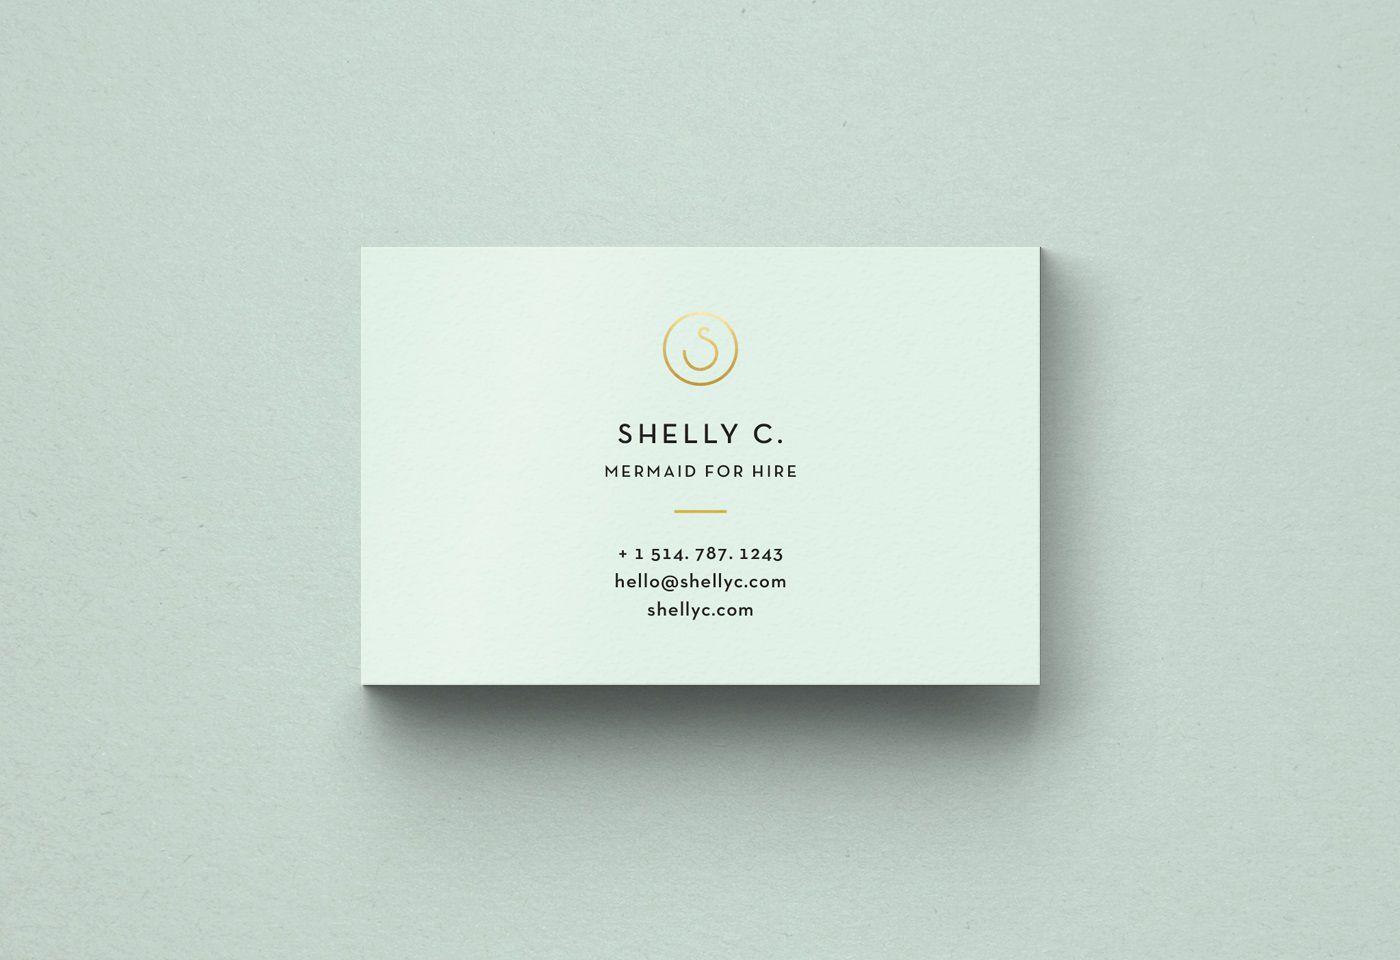 002 Breathtaking Minimal Busines Card Template Free Download Concept  Simple Design CoreldrawFull